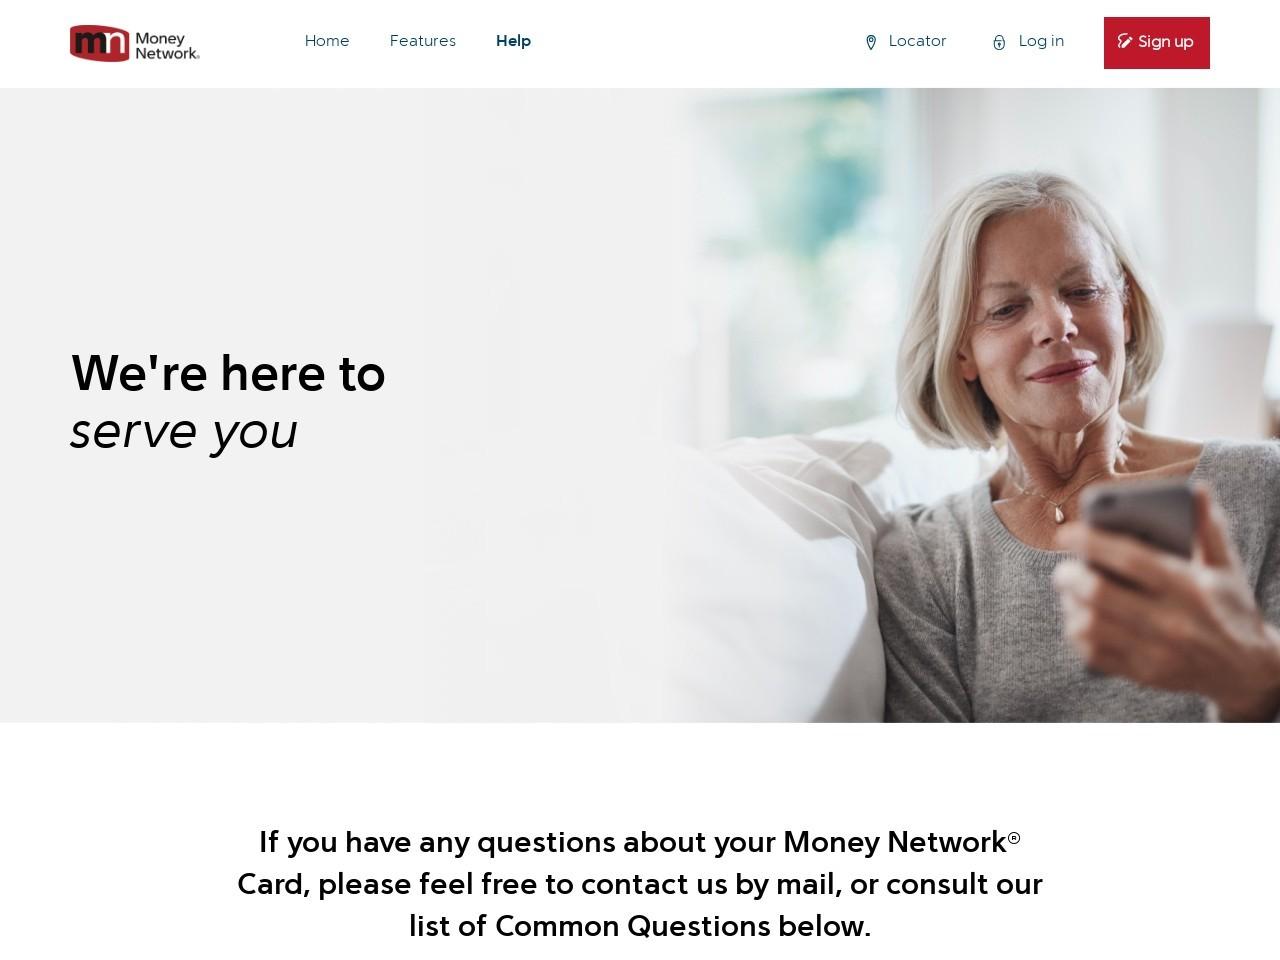 Money Network Customer Service